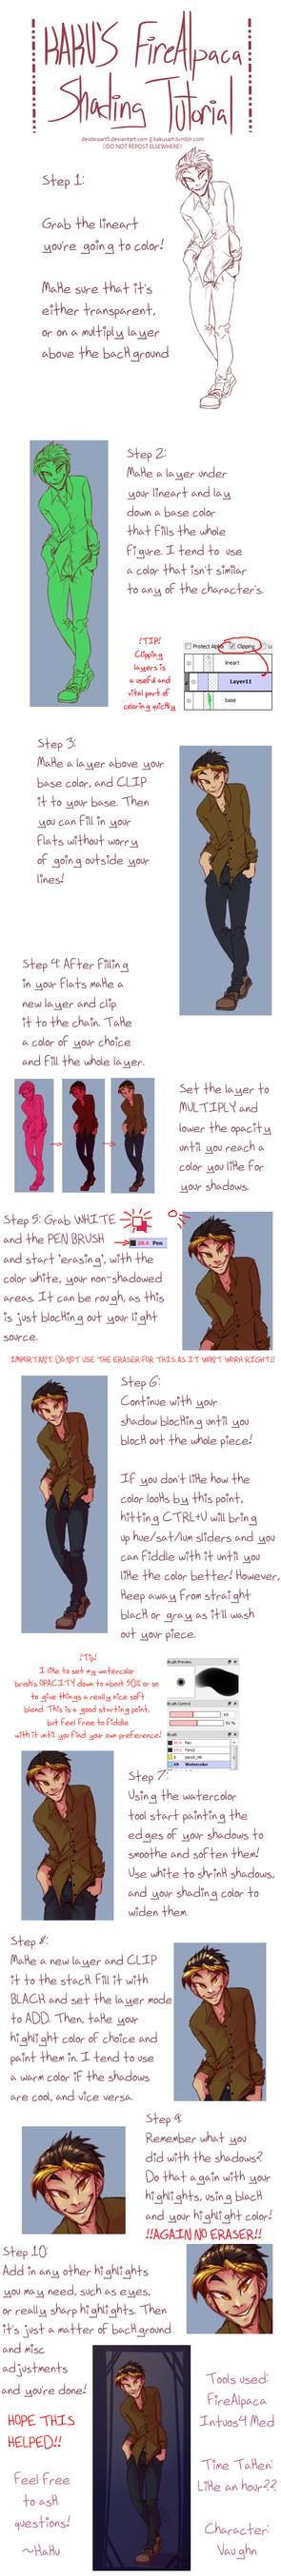 FireAlpaca Coloring Tutorial - The Kaku Way by deidaraart5